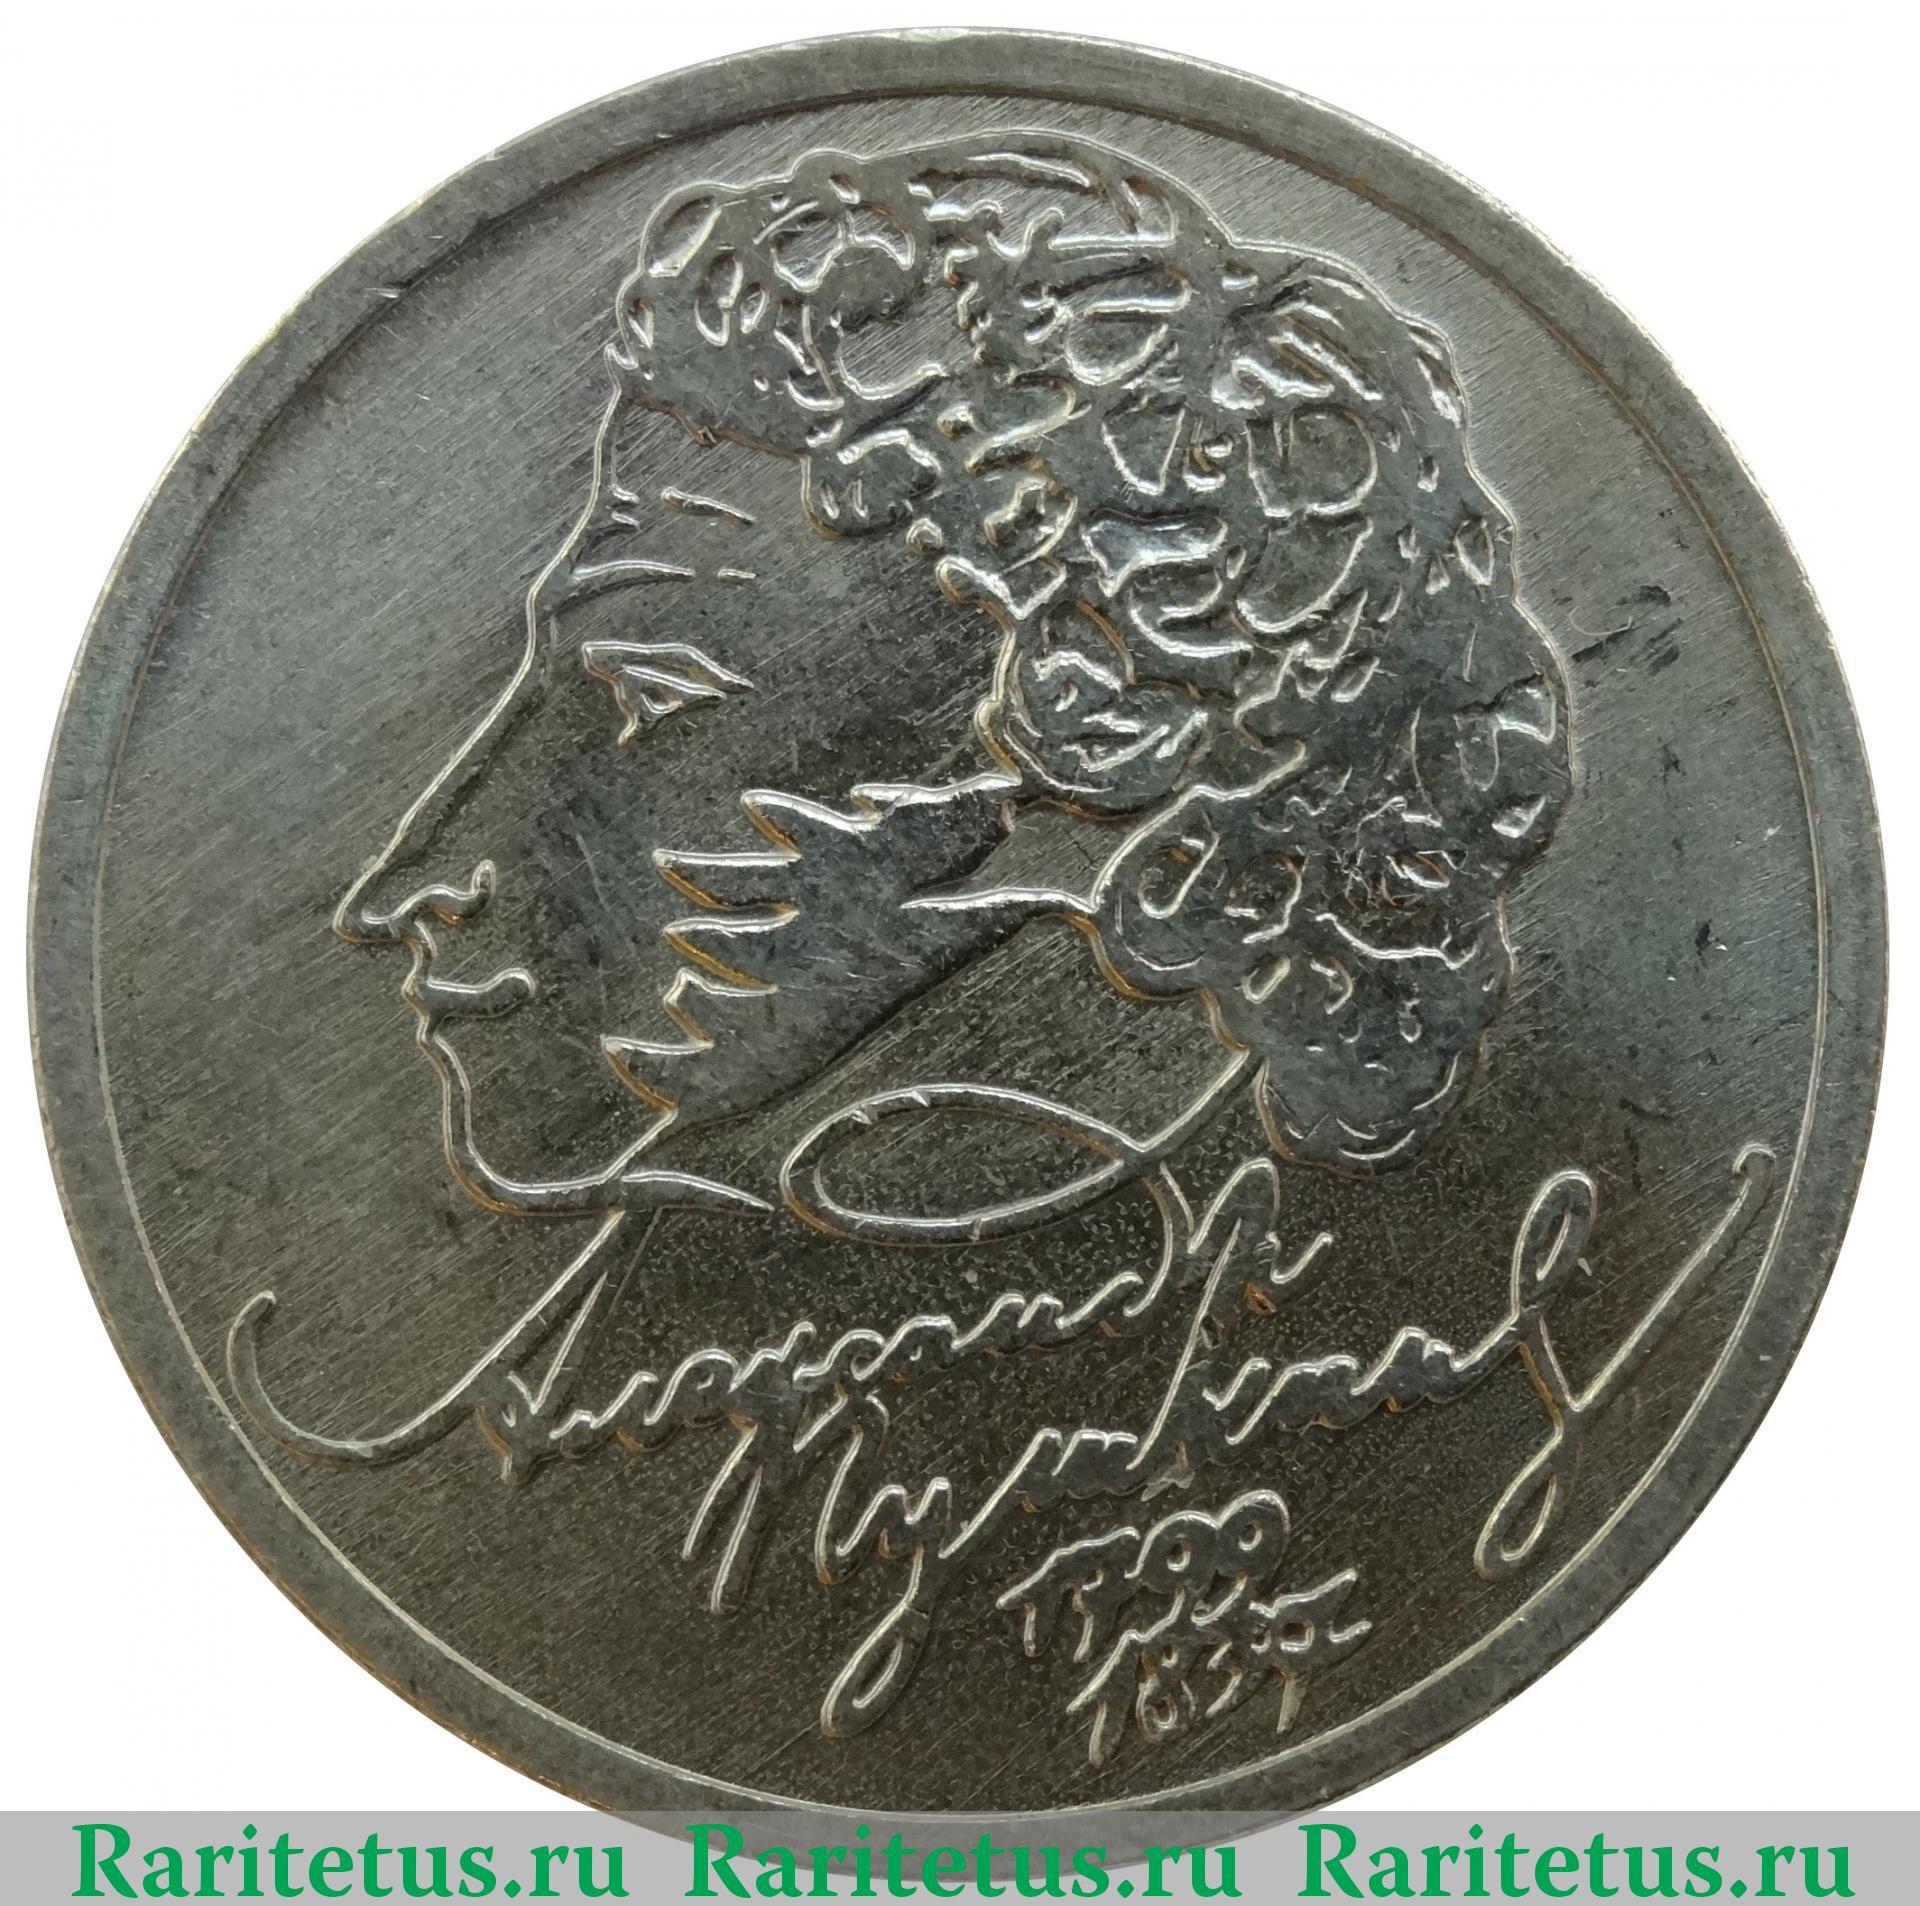 Цена 1 рубль пушкин ммд советские металлические рубли